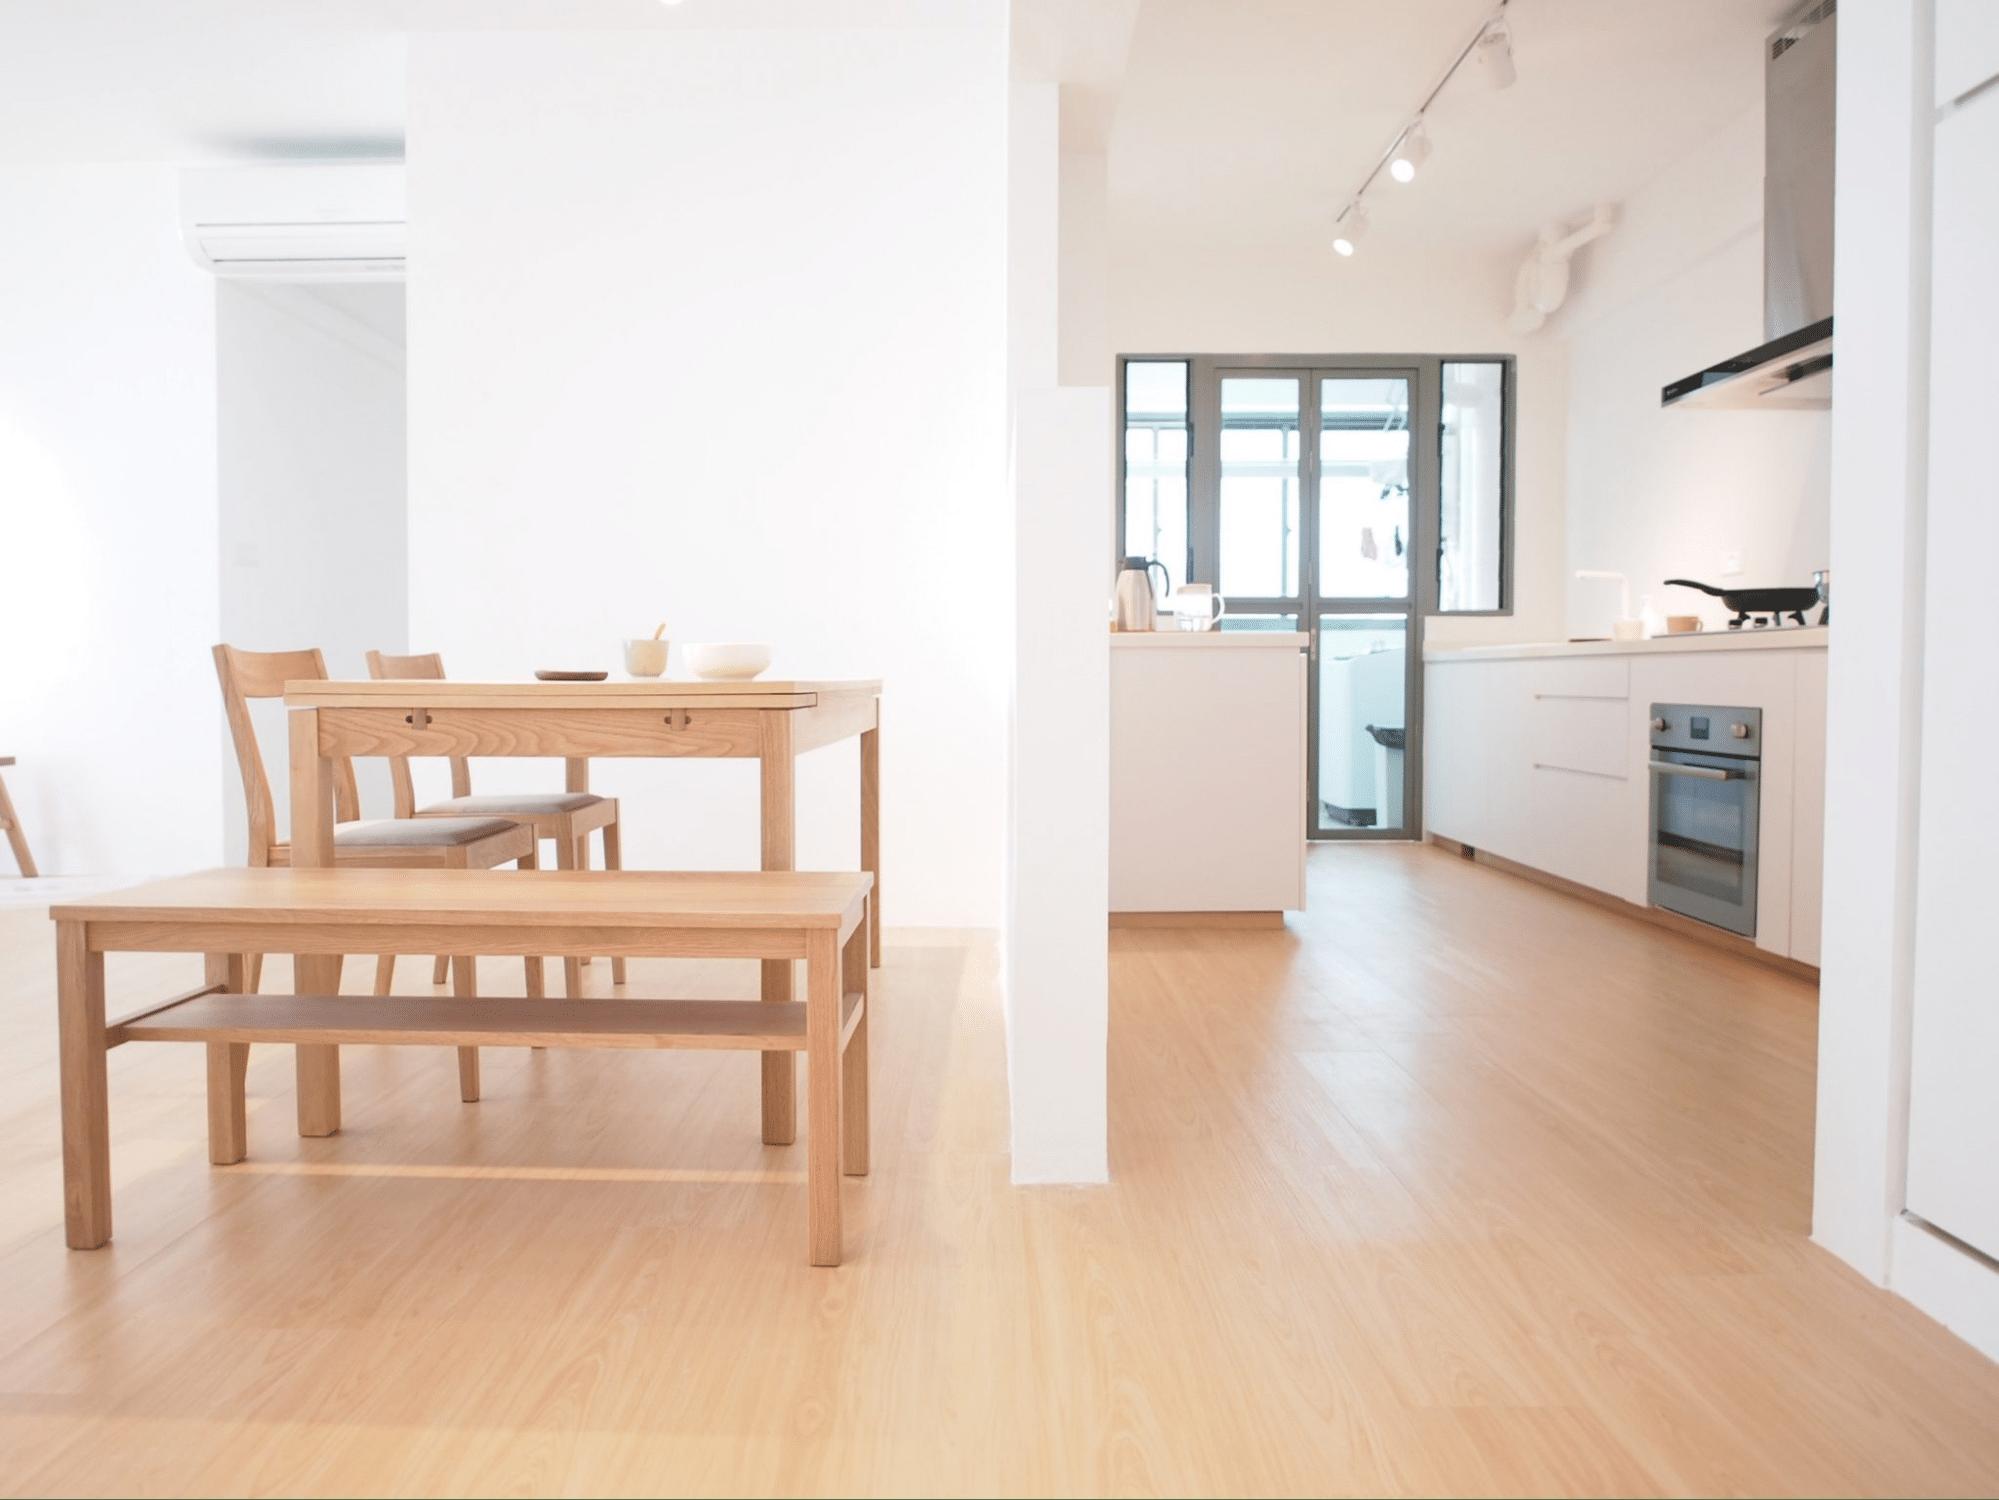 Muji inspired interior design with lightwood beige flooring